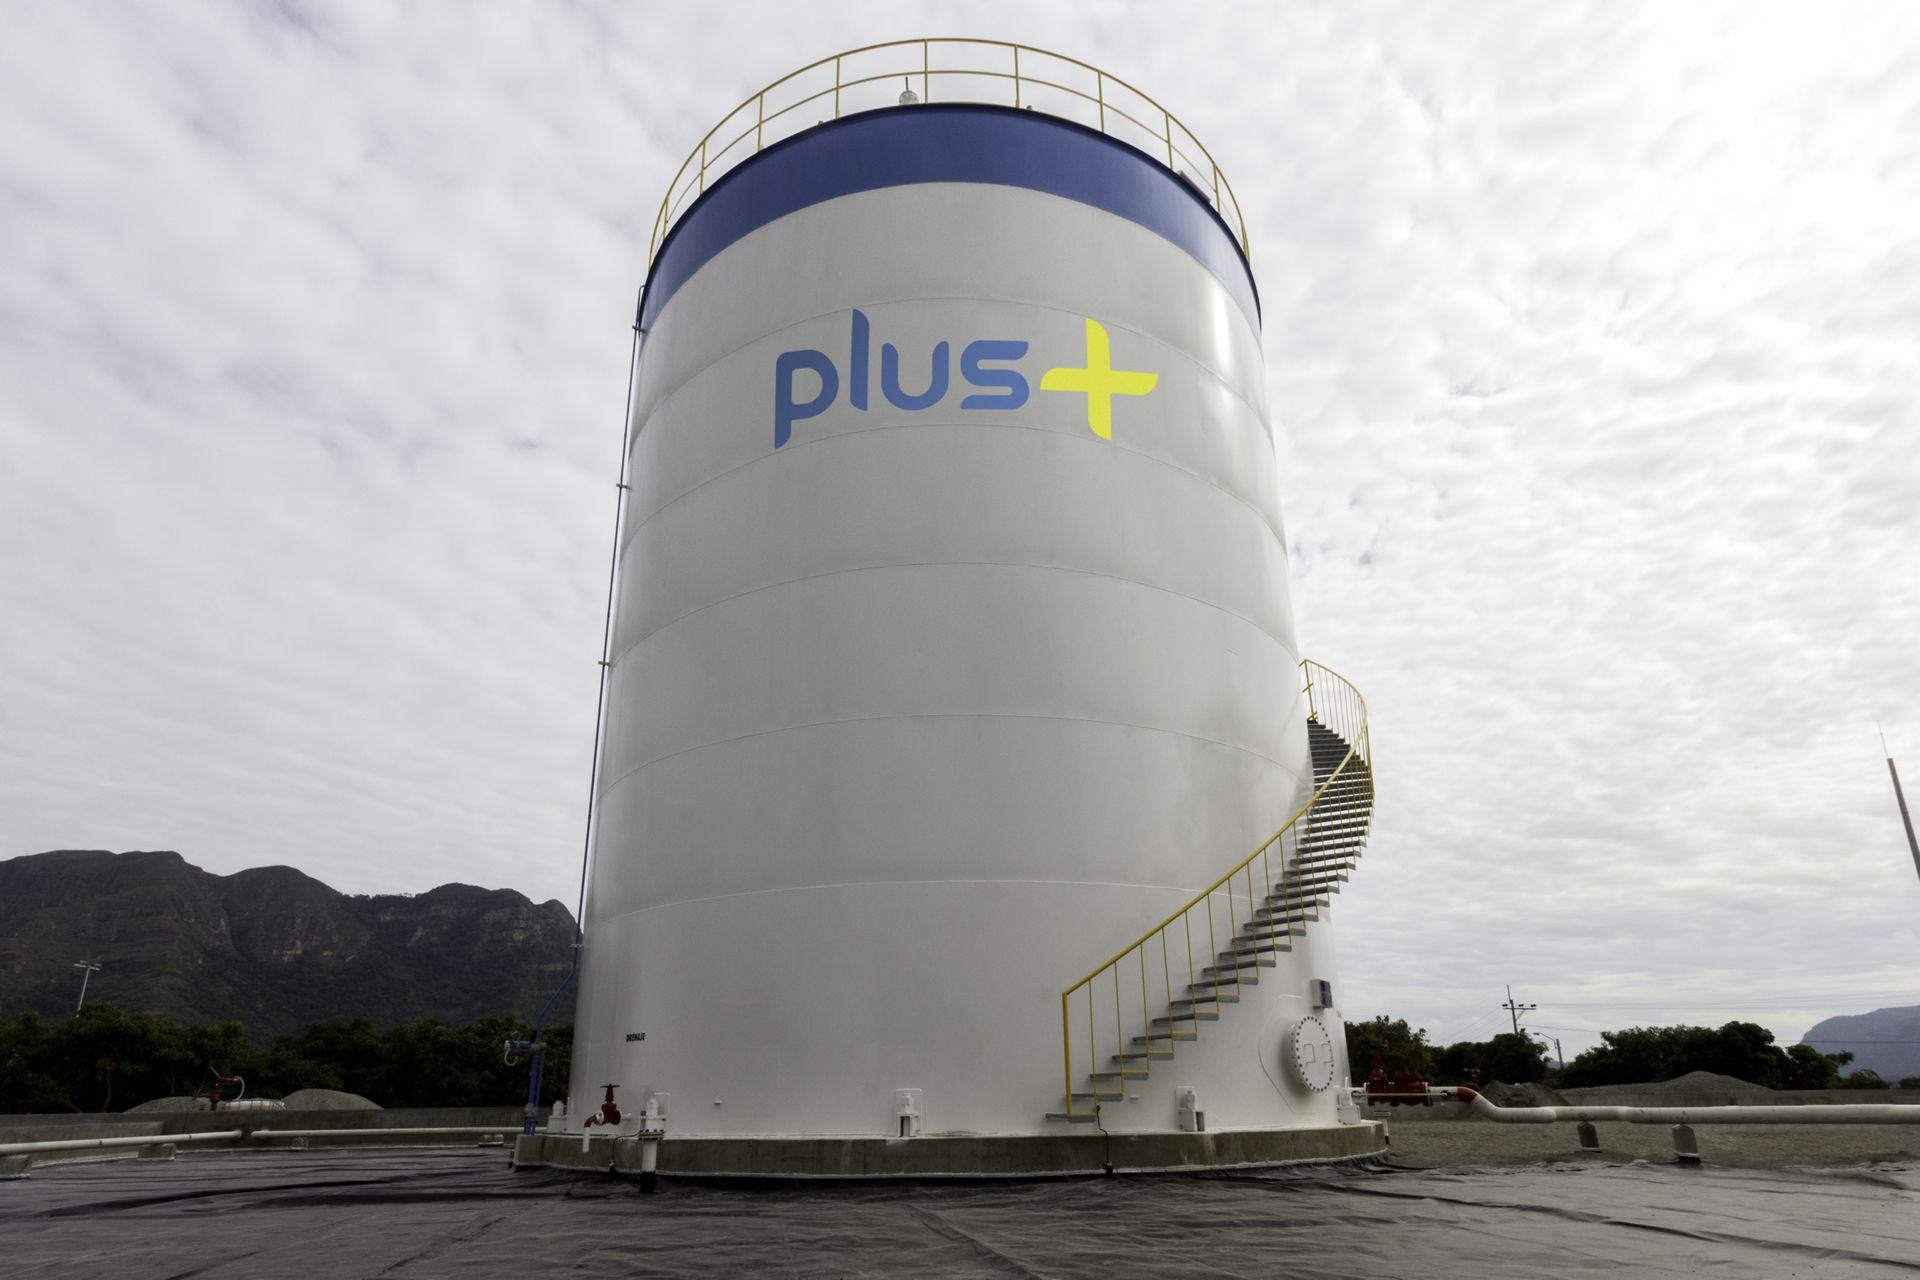 Plus+_019-Editar-compressor